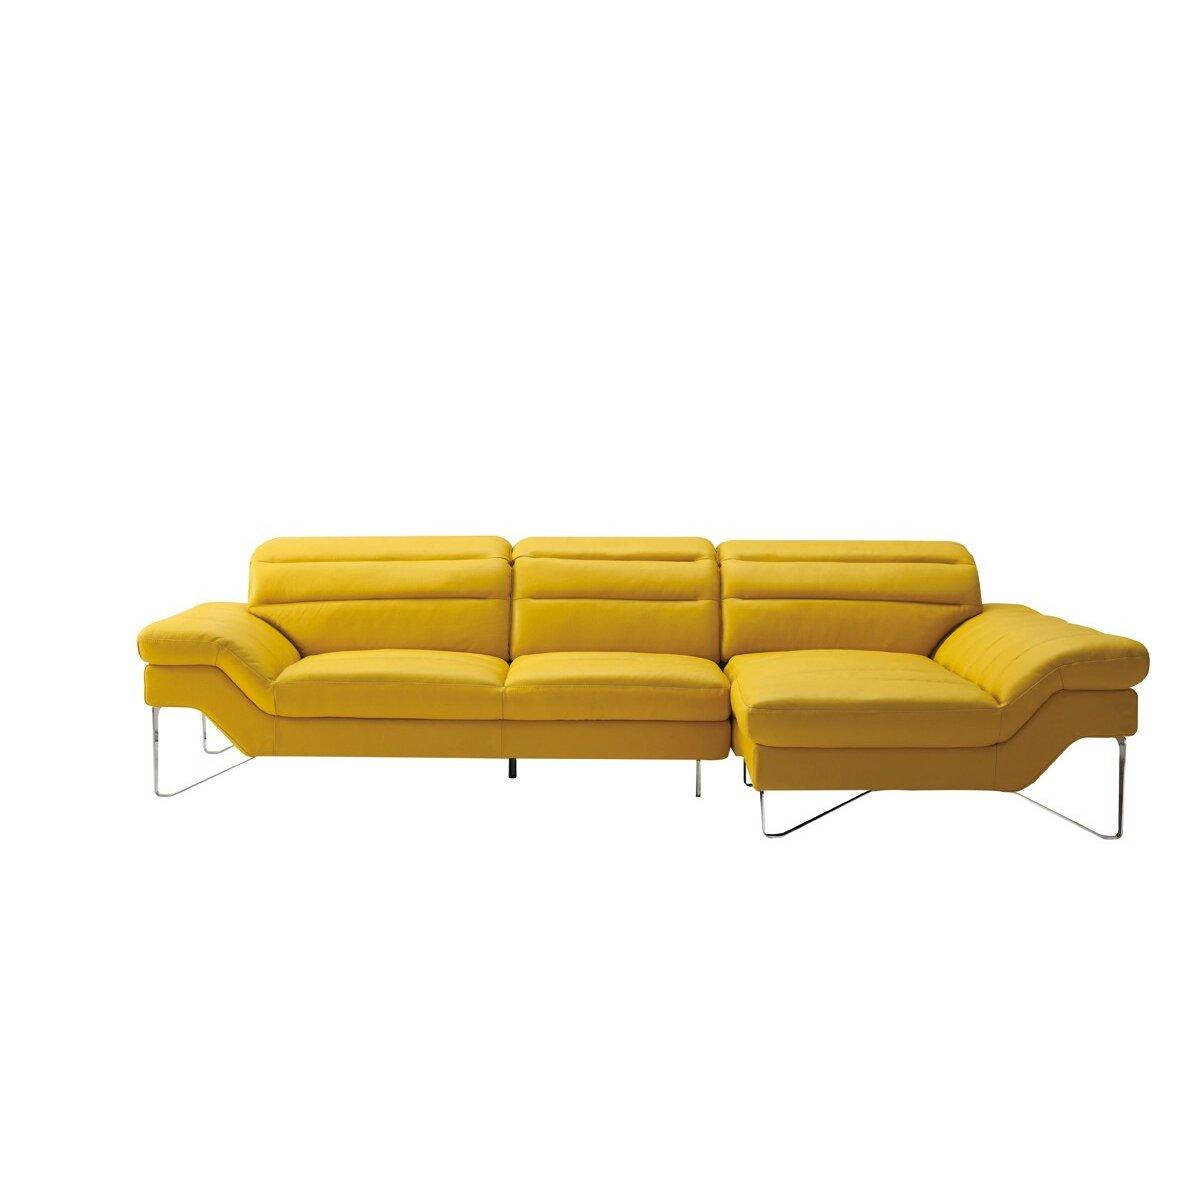 Wade Logan Rodolfo Leather Sofa